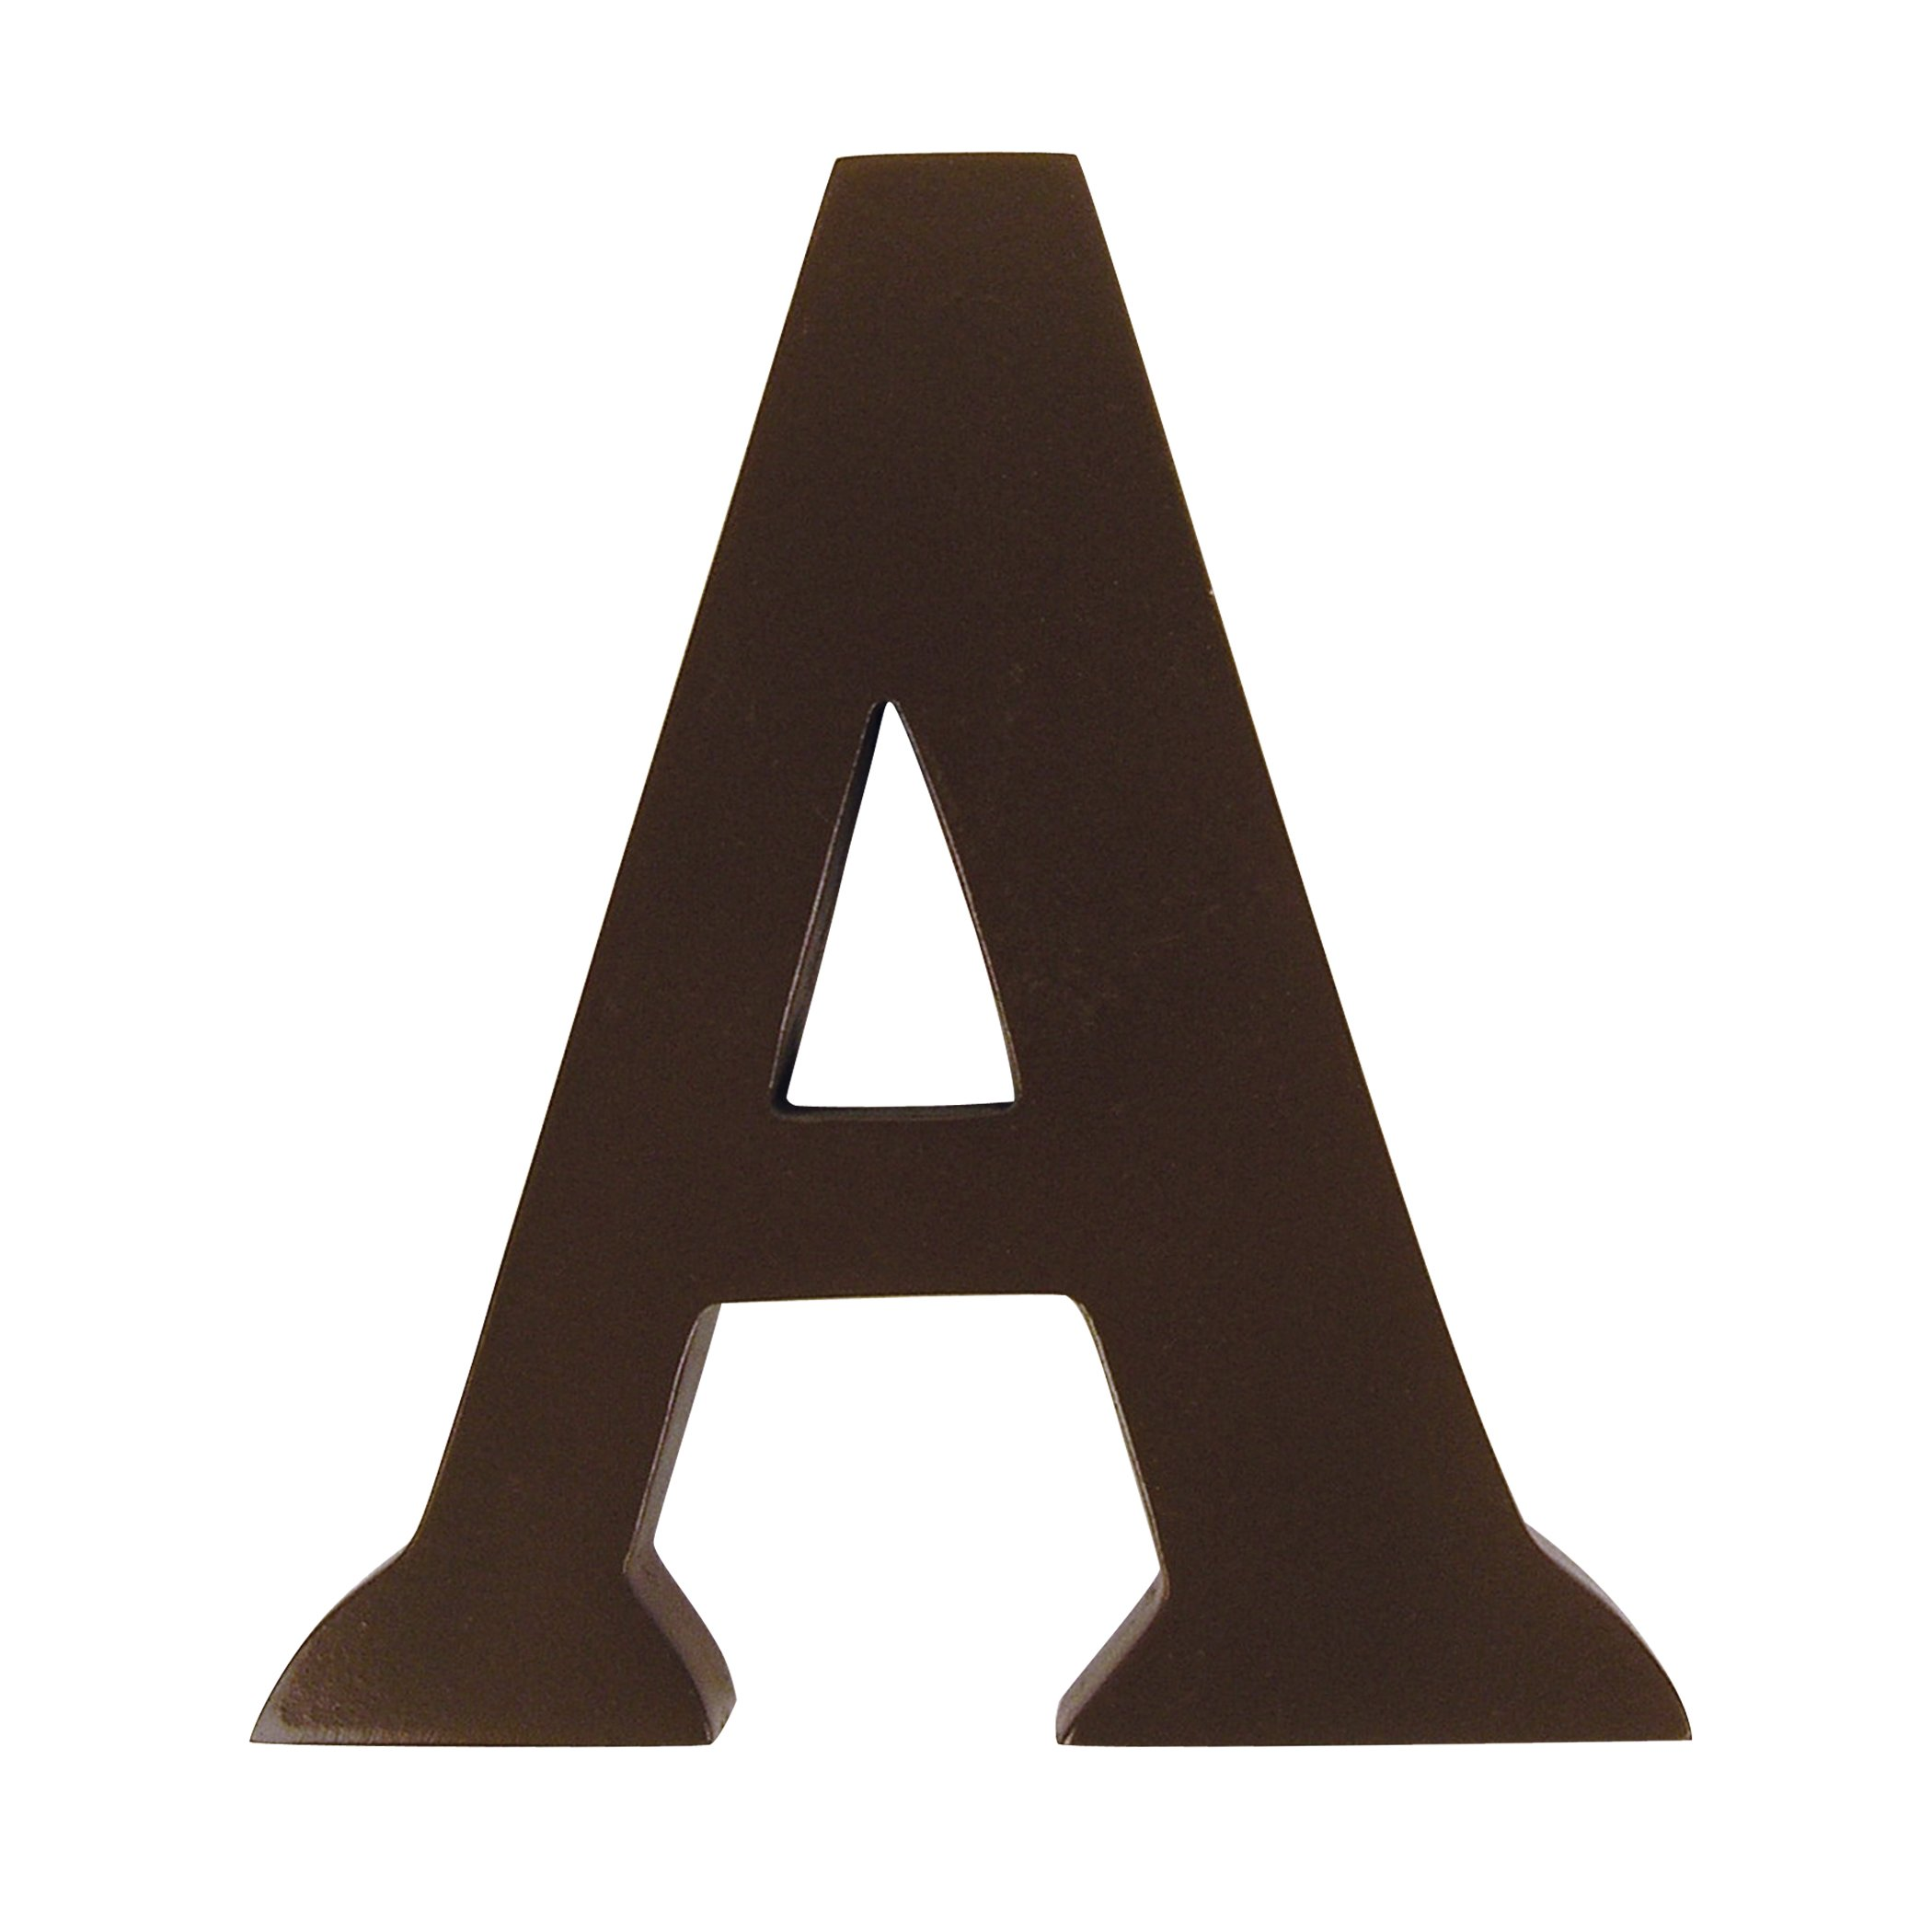 best decorative metal letters for shelf amazon com rh amazon com Shelves for Decorative Letters Alphabet A Letter Shelf for Decorative Art